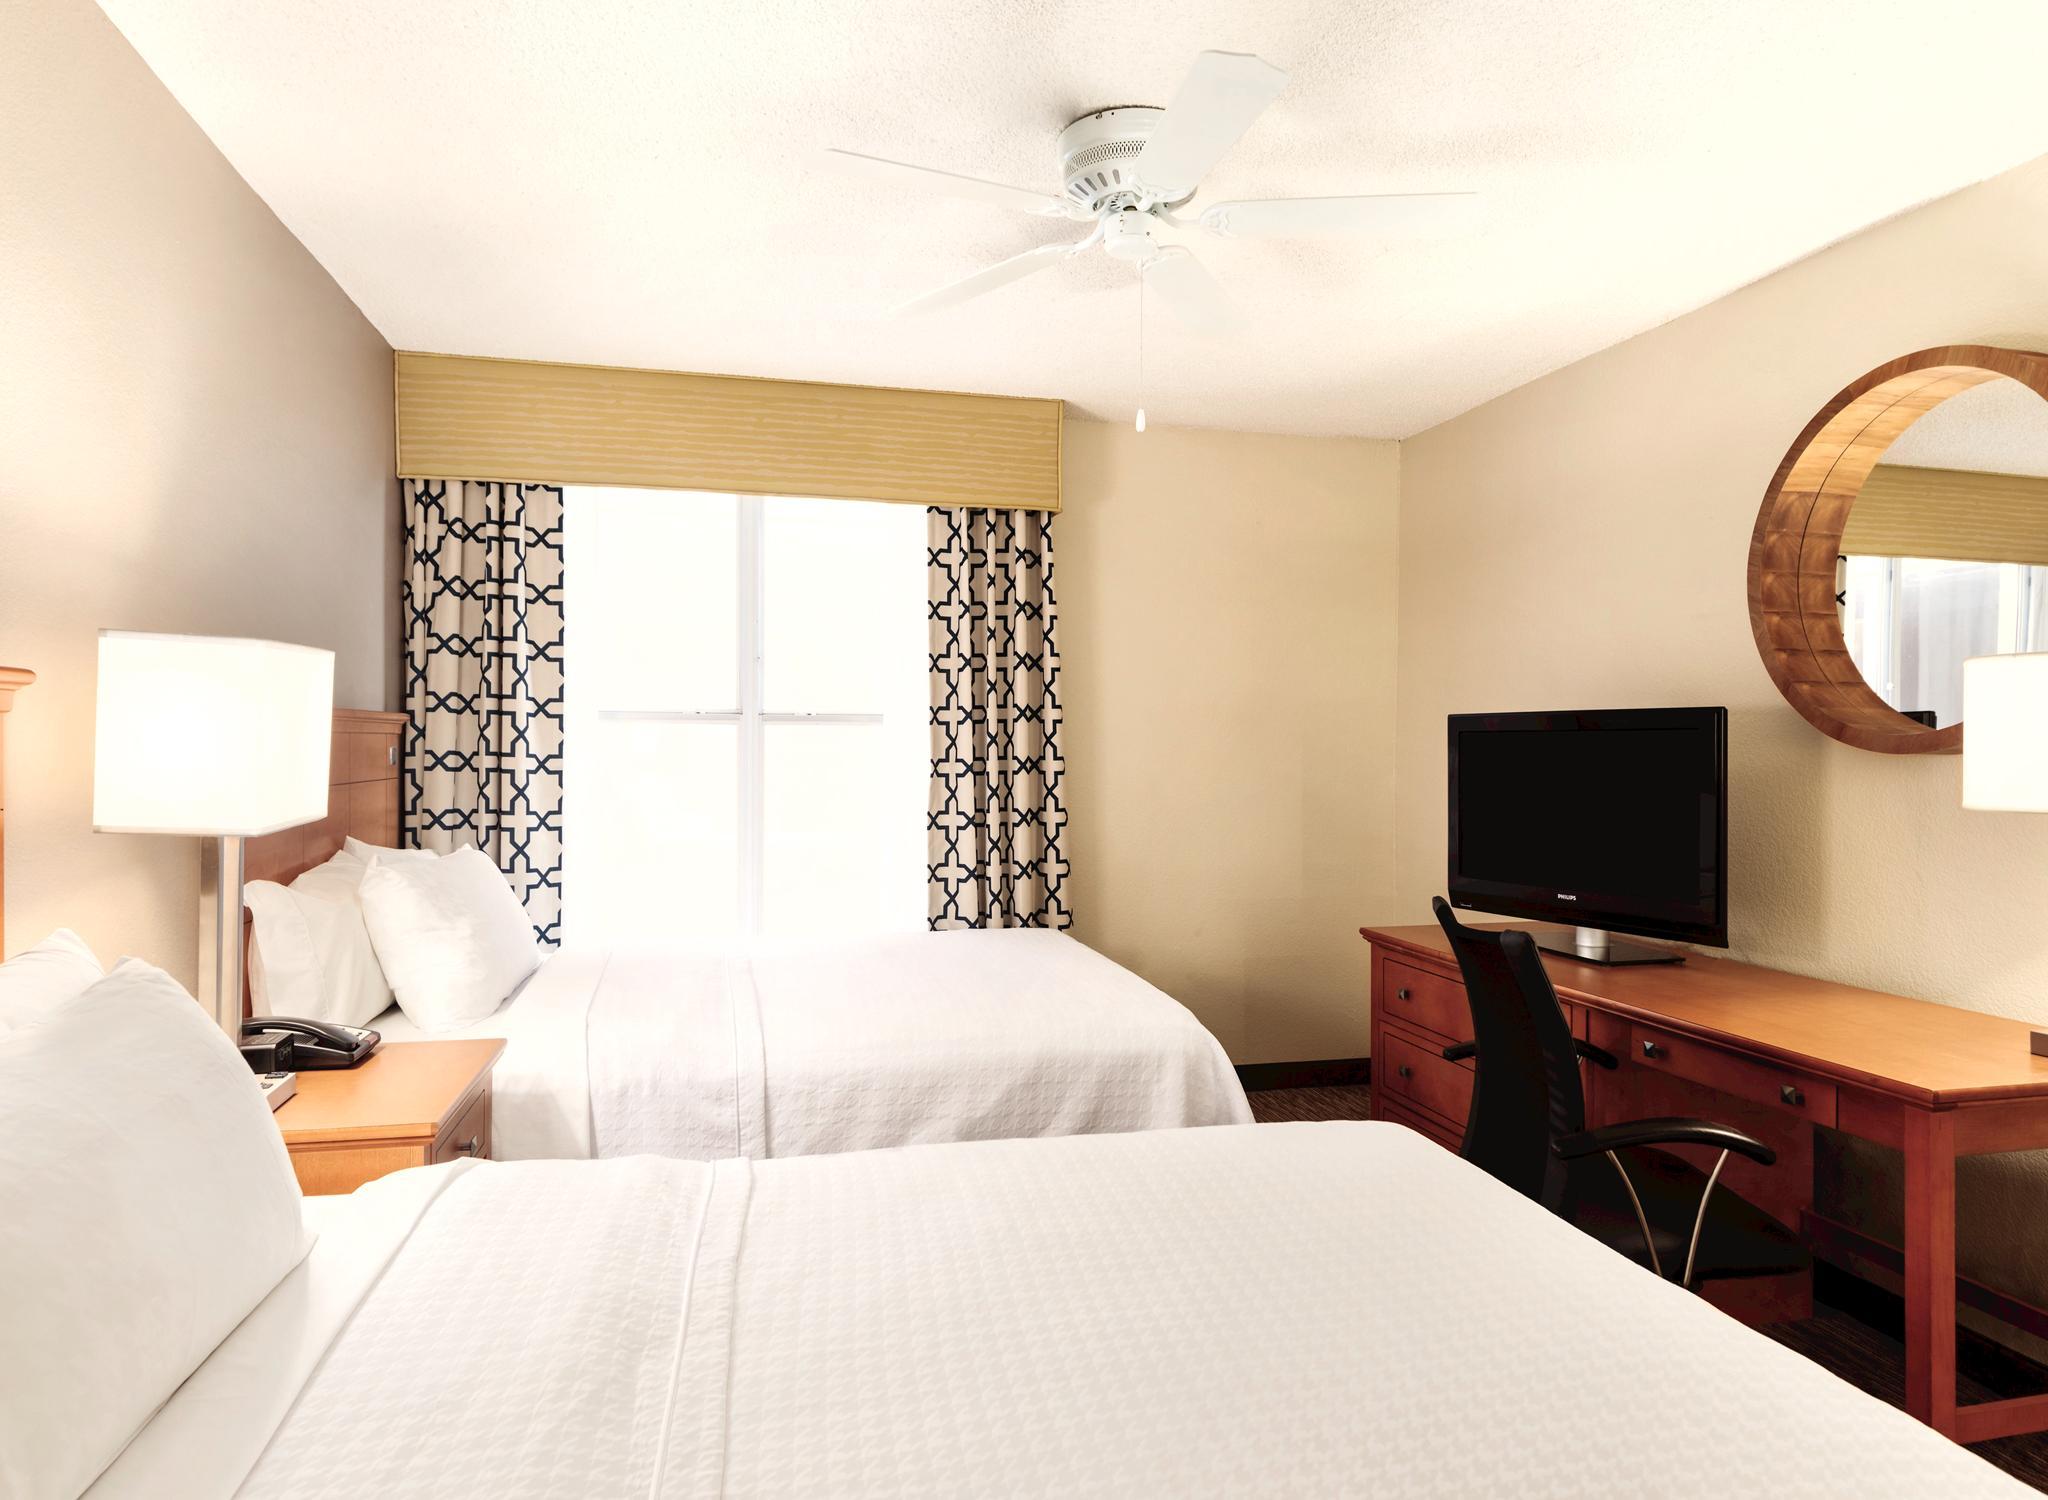 2 Bedroom Suites In Orlando On International Drive Homewood Suites Orlando International Drive Hotel